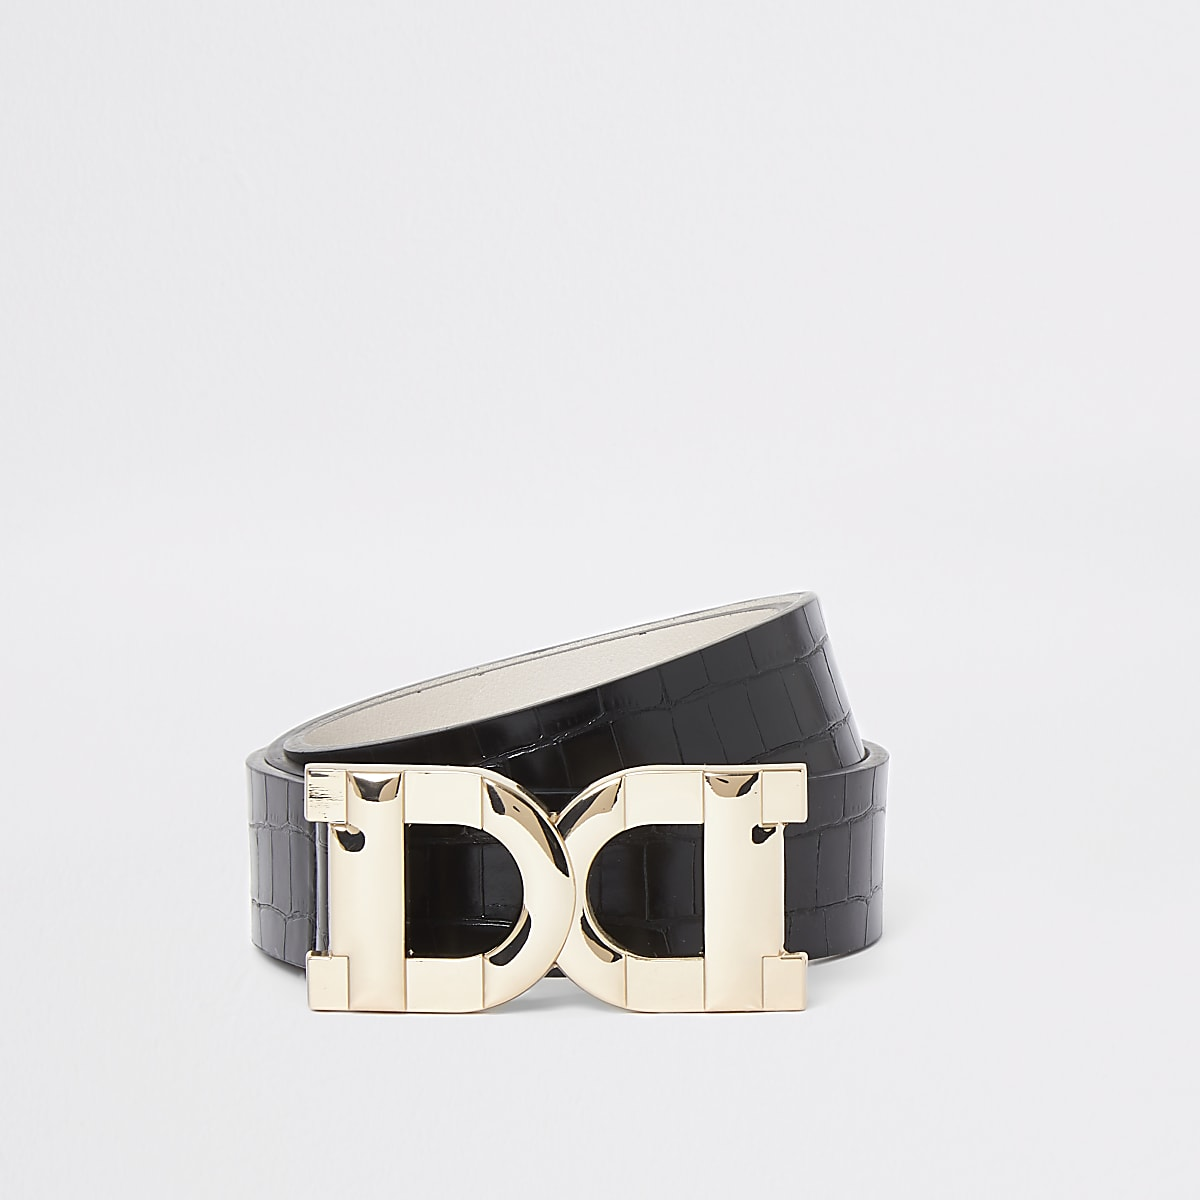 Black D double ring belt